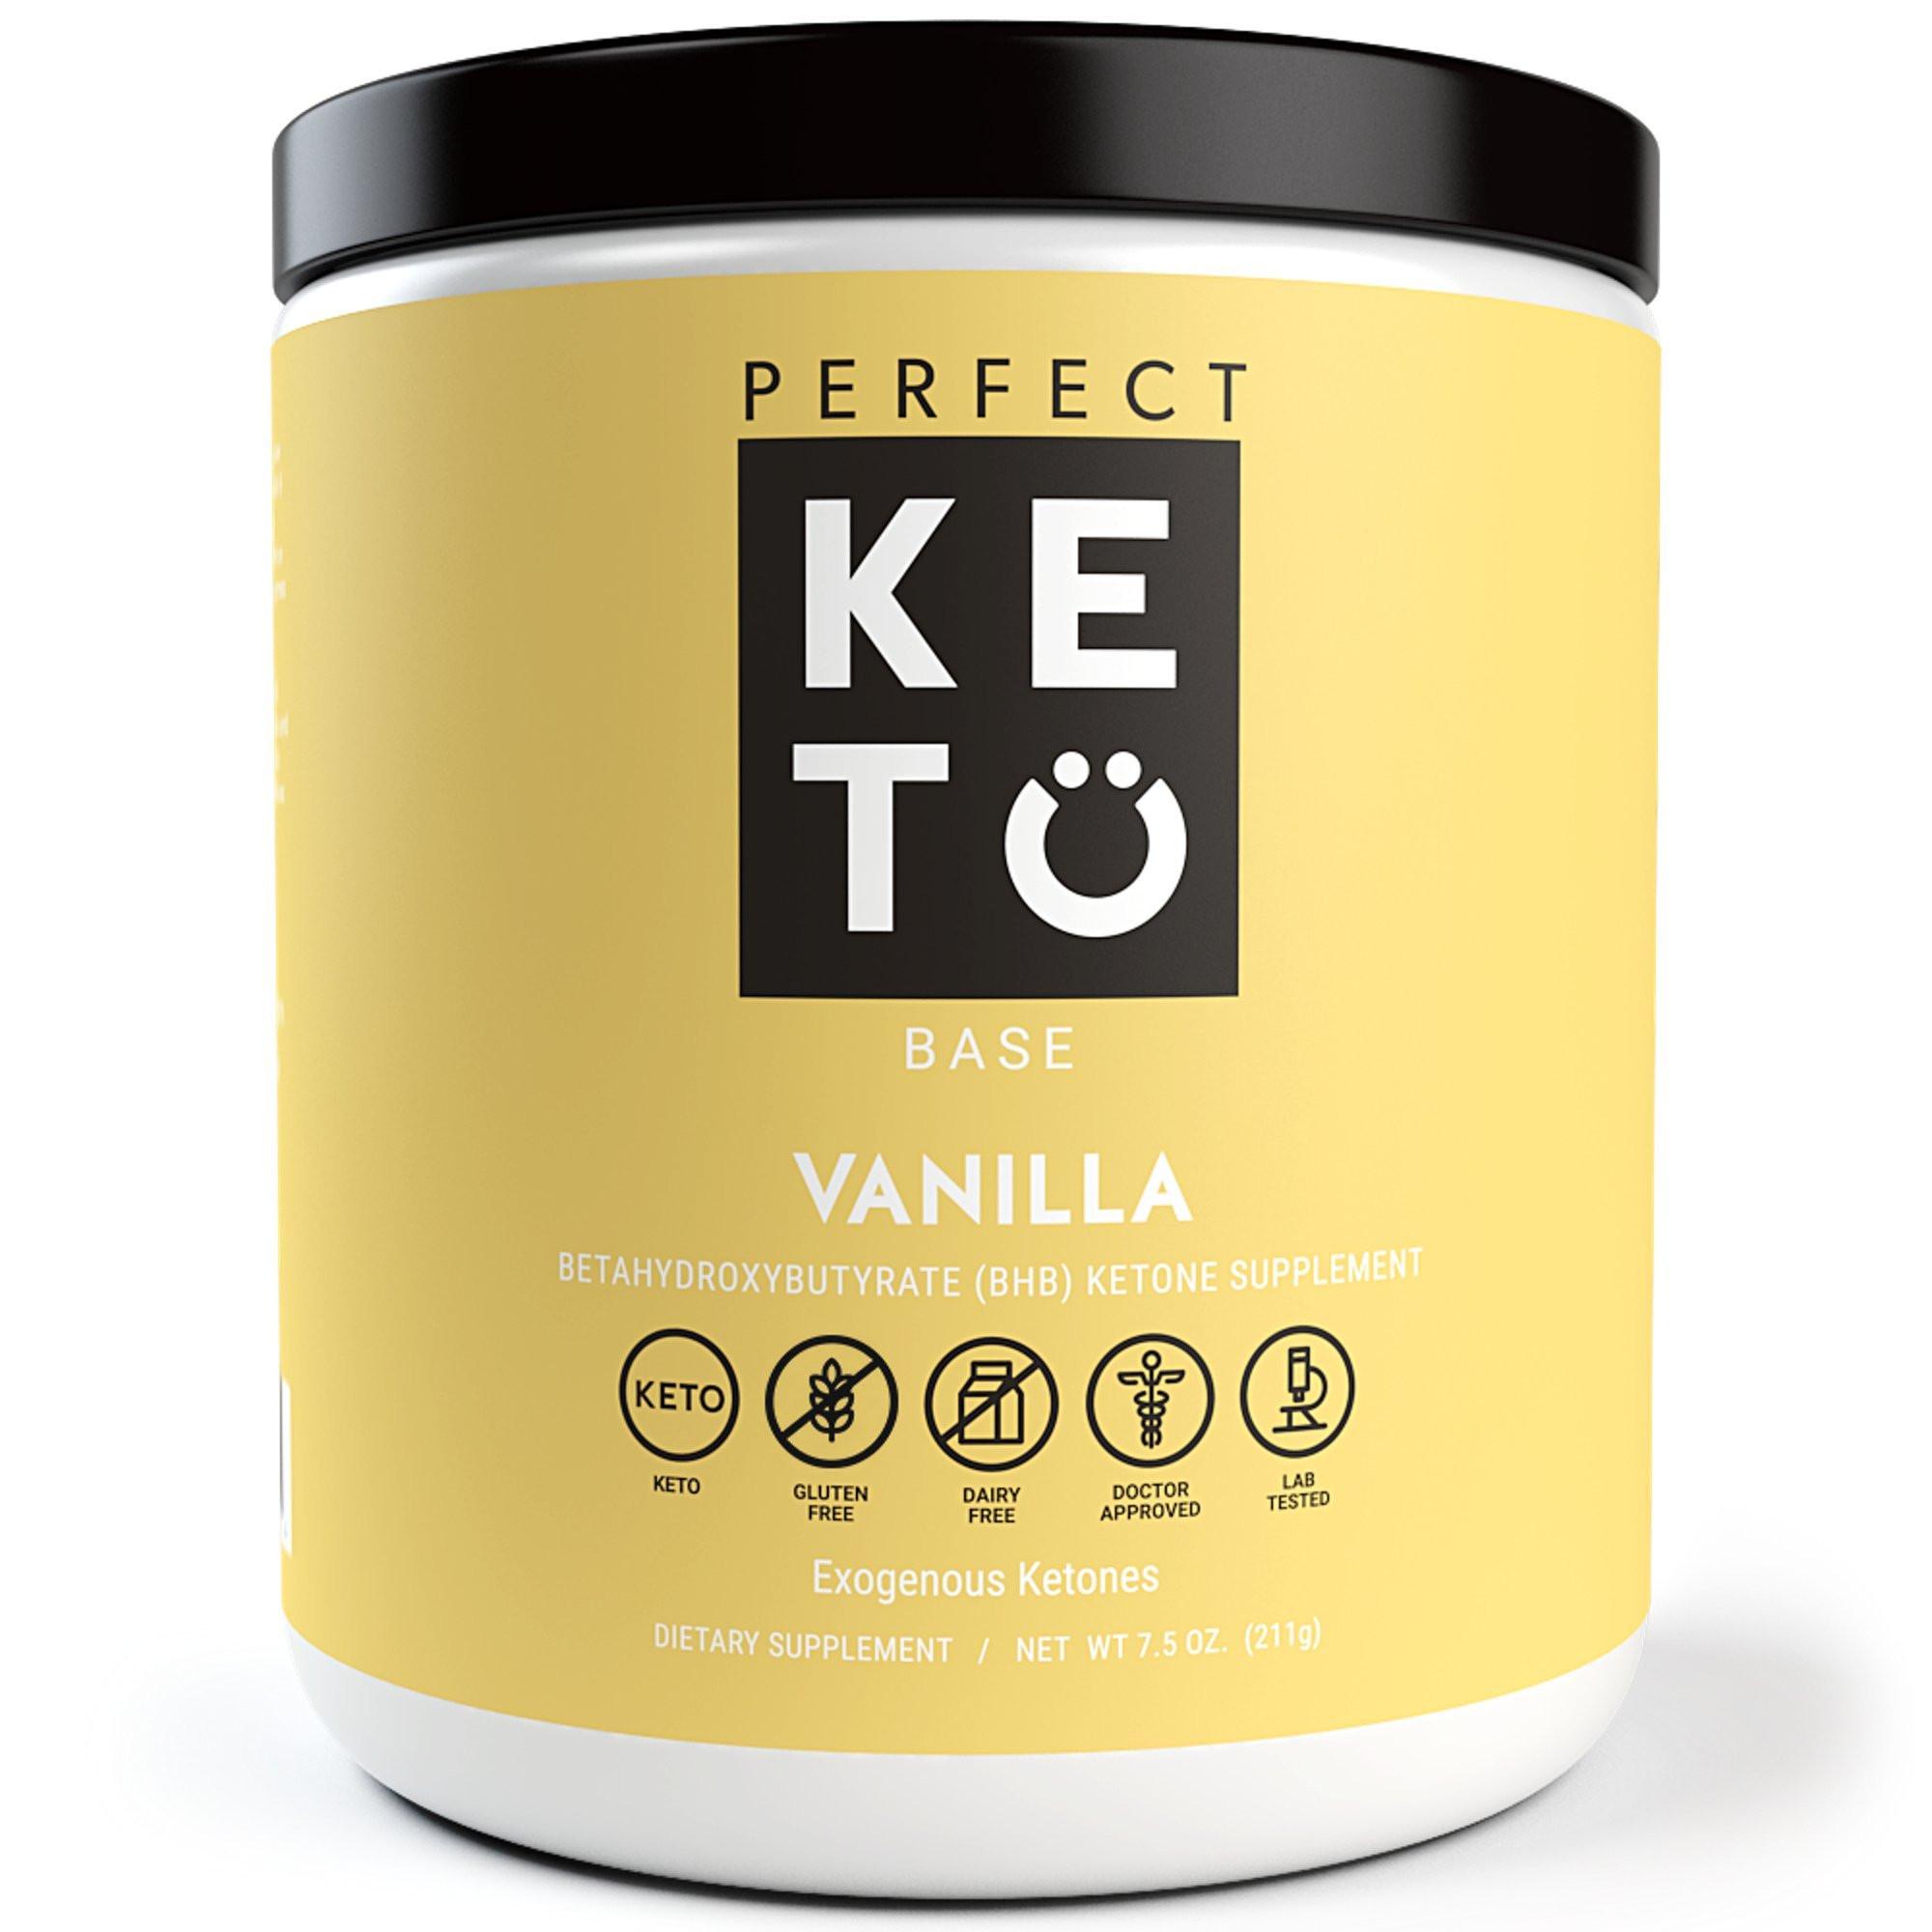 Keto Diet Protein Powder  Amazon Perfect Keto Protein Powder Pure Grass fed